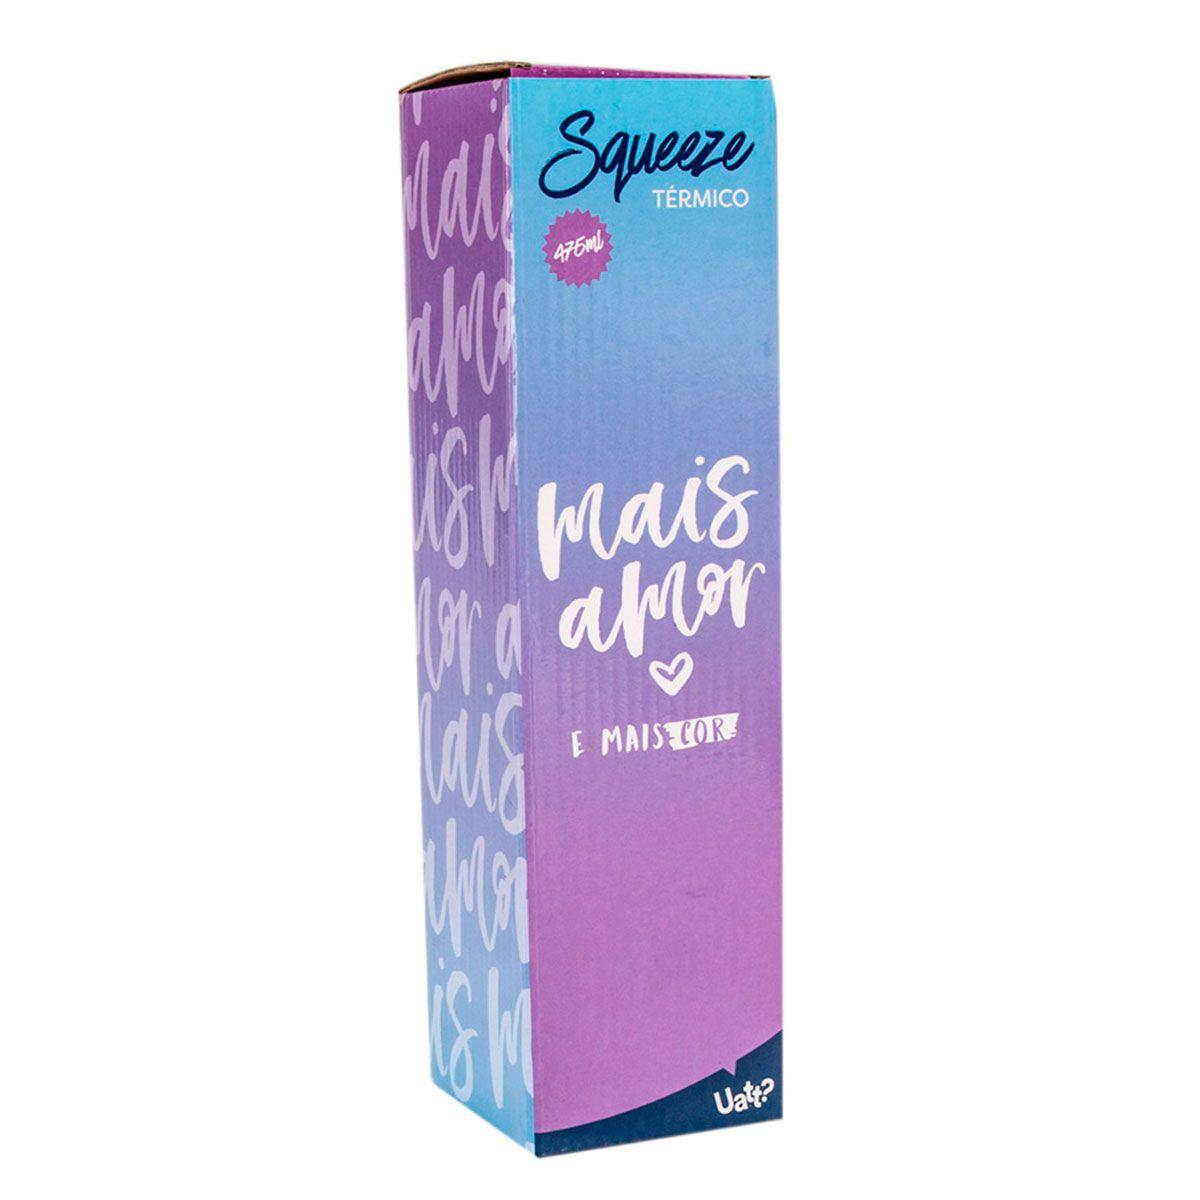 Garrafa Cantil Térmico Retrô 475 ml Mais Amor